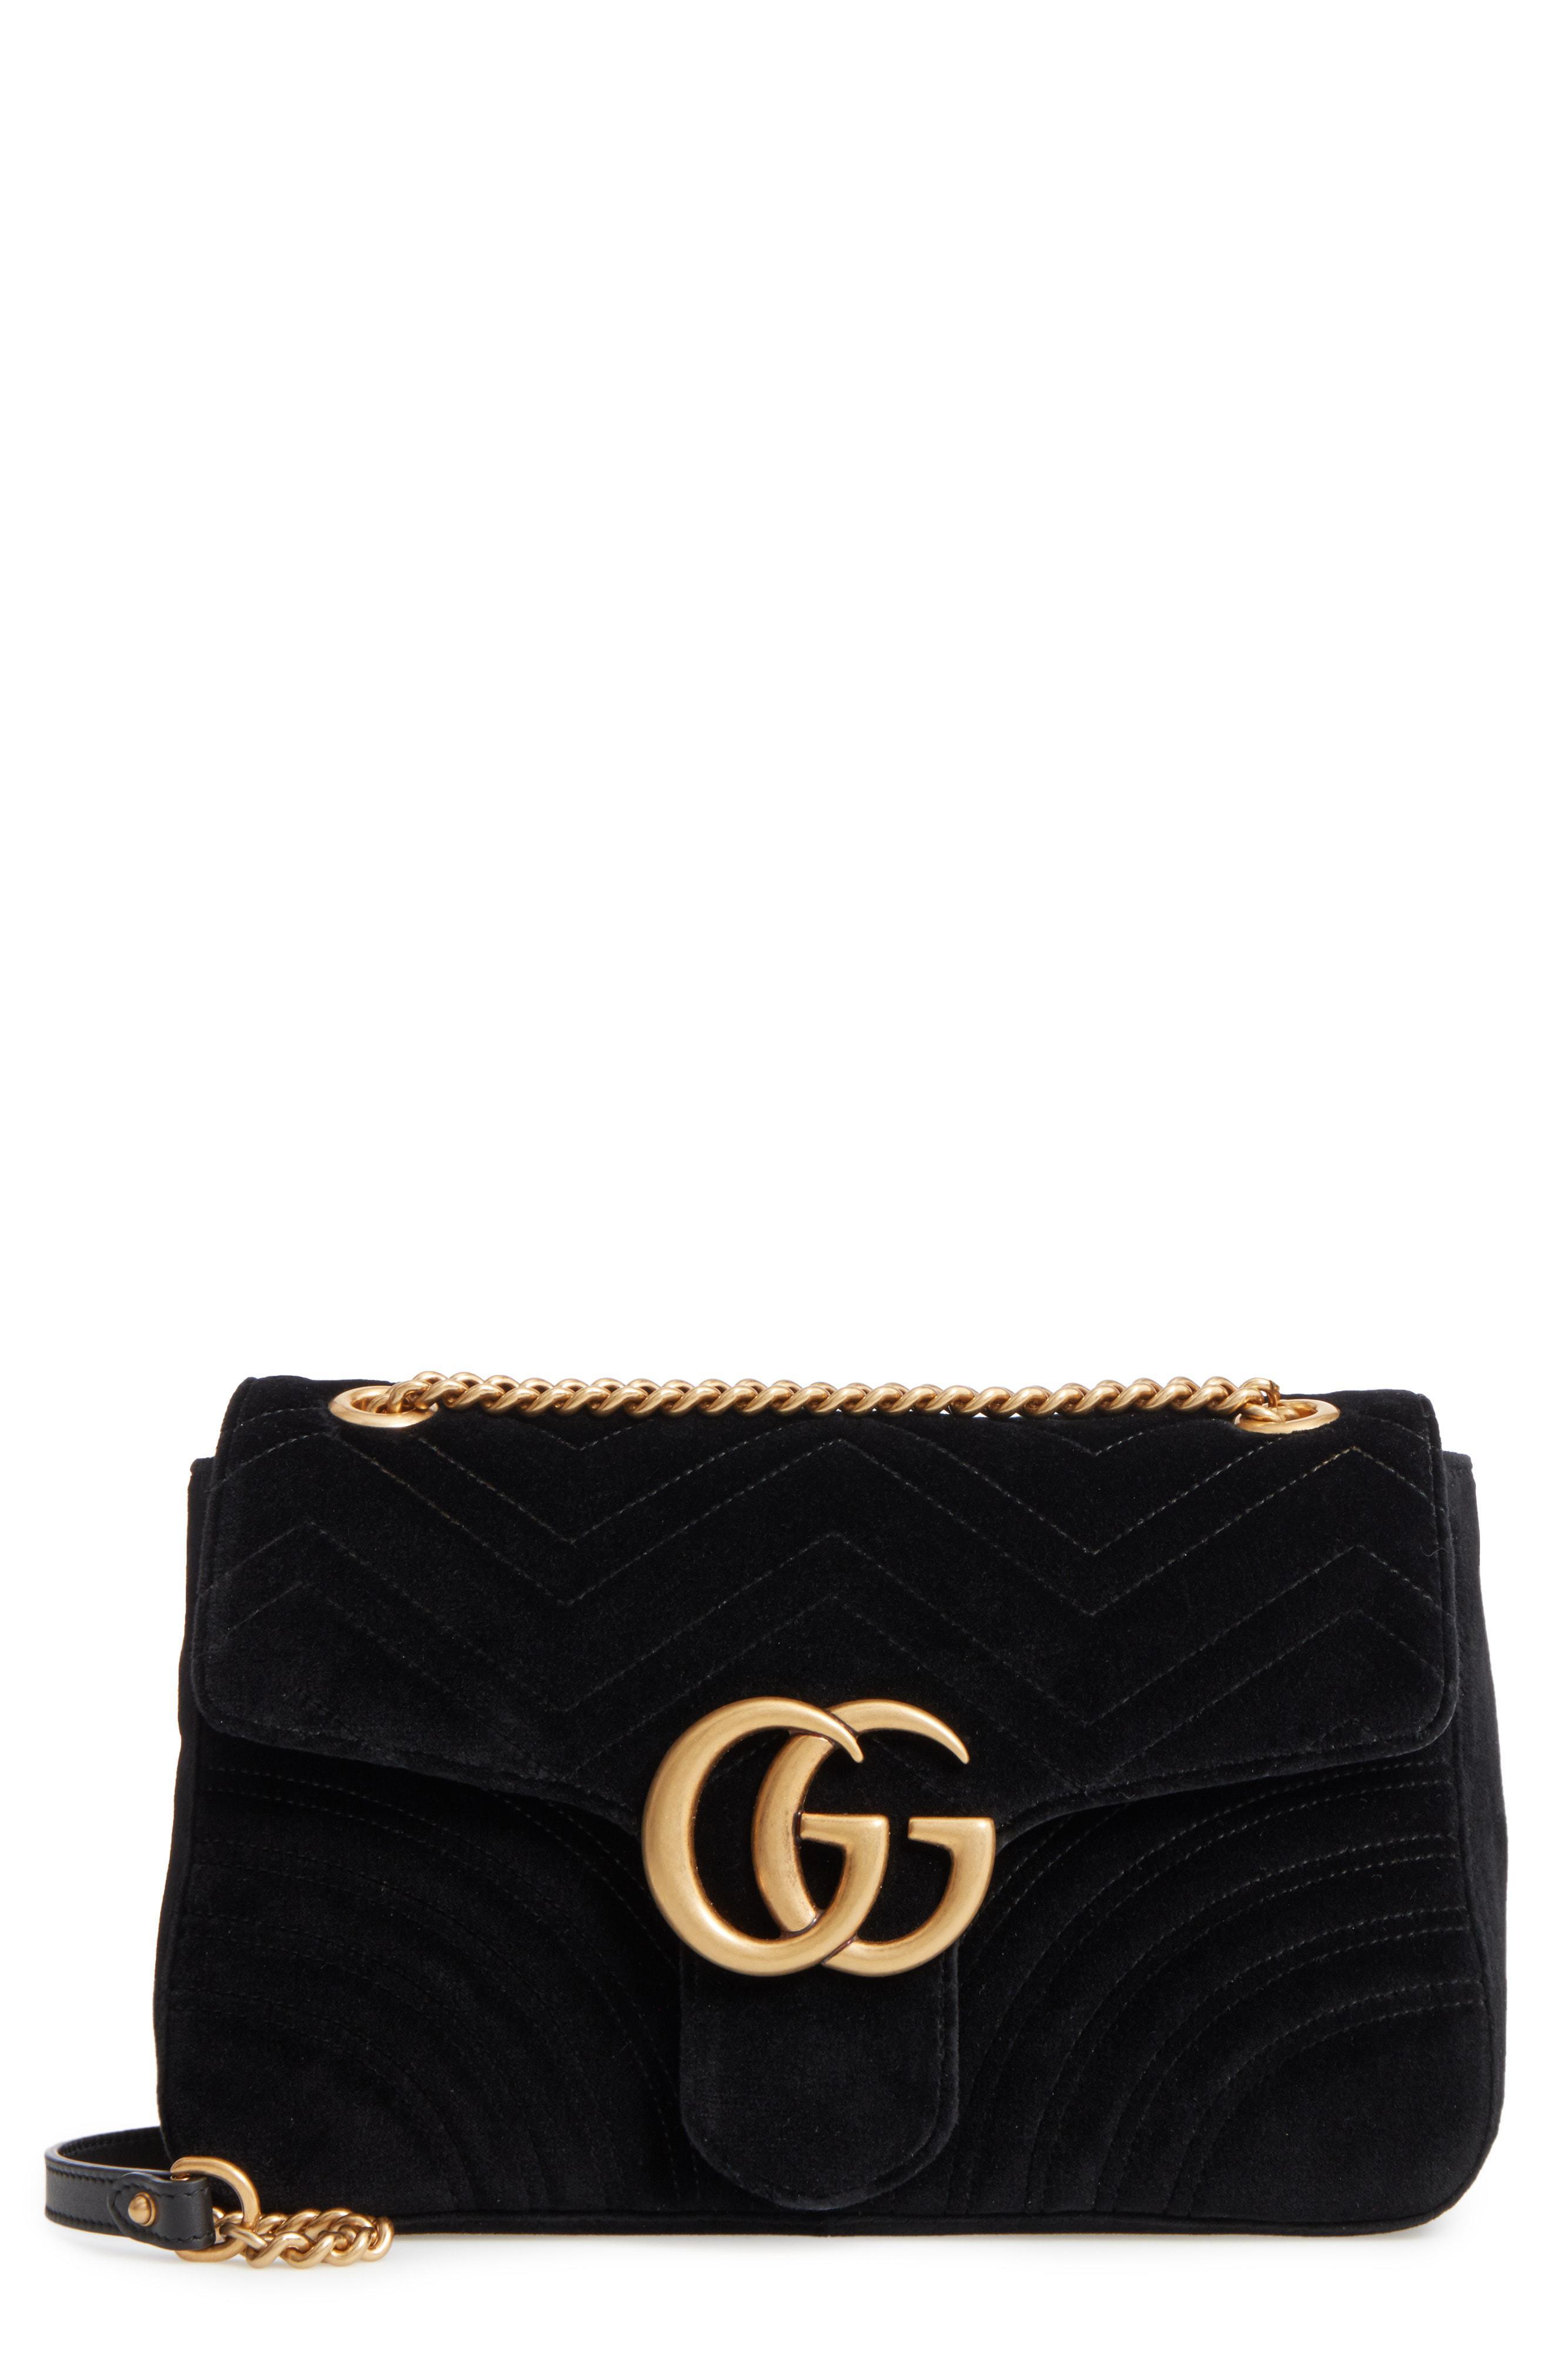 aff157994ea Gucci. Women s Purple Medium Gg Marmont 2.0 Matelasse Velvet Shoulder Bag -